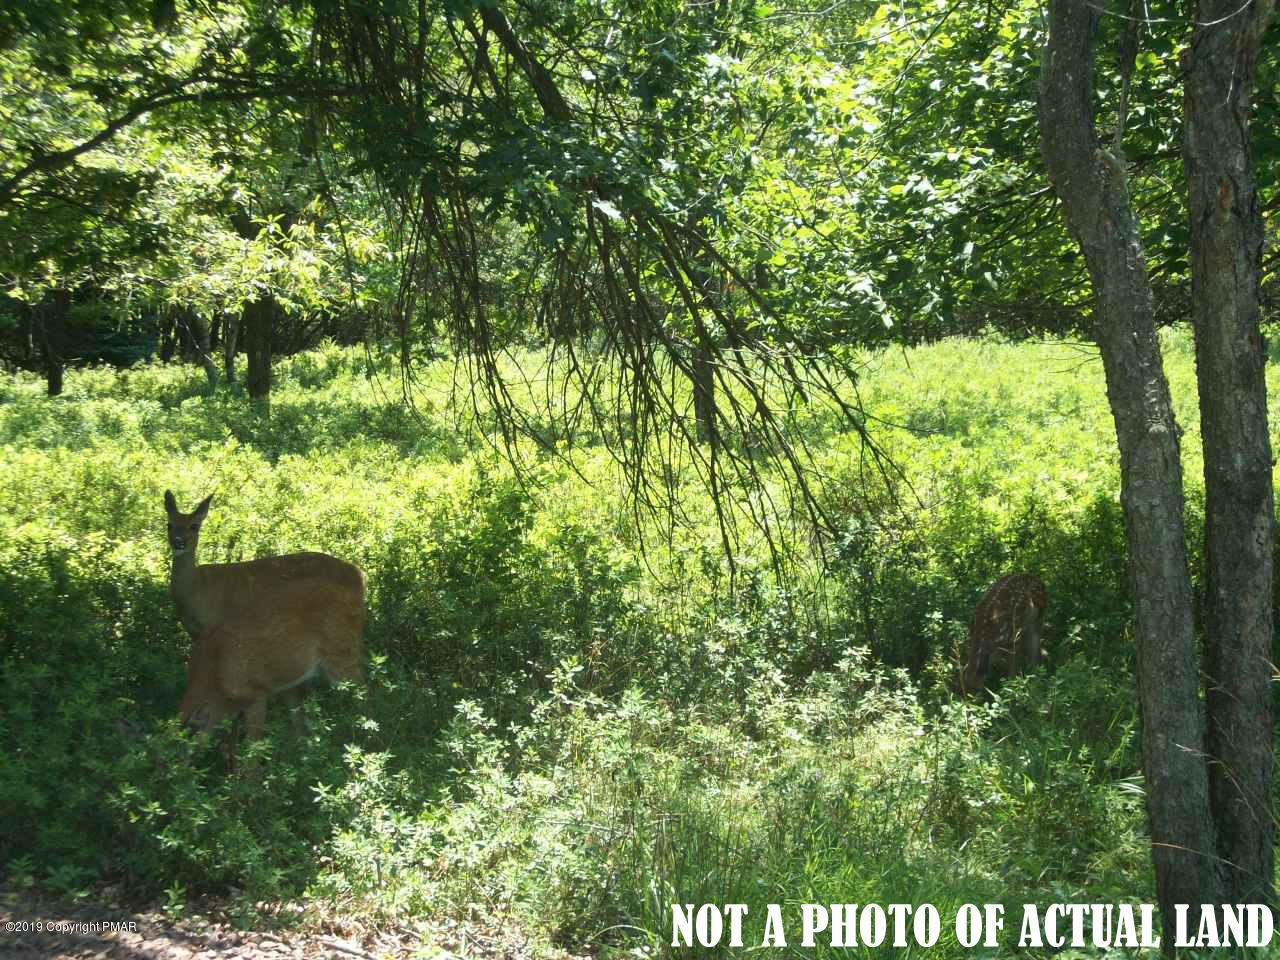 A540 Birch Lane, Albrightsville, PA, 18210 United States